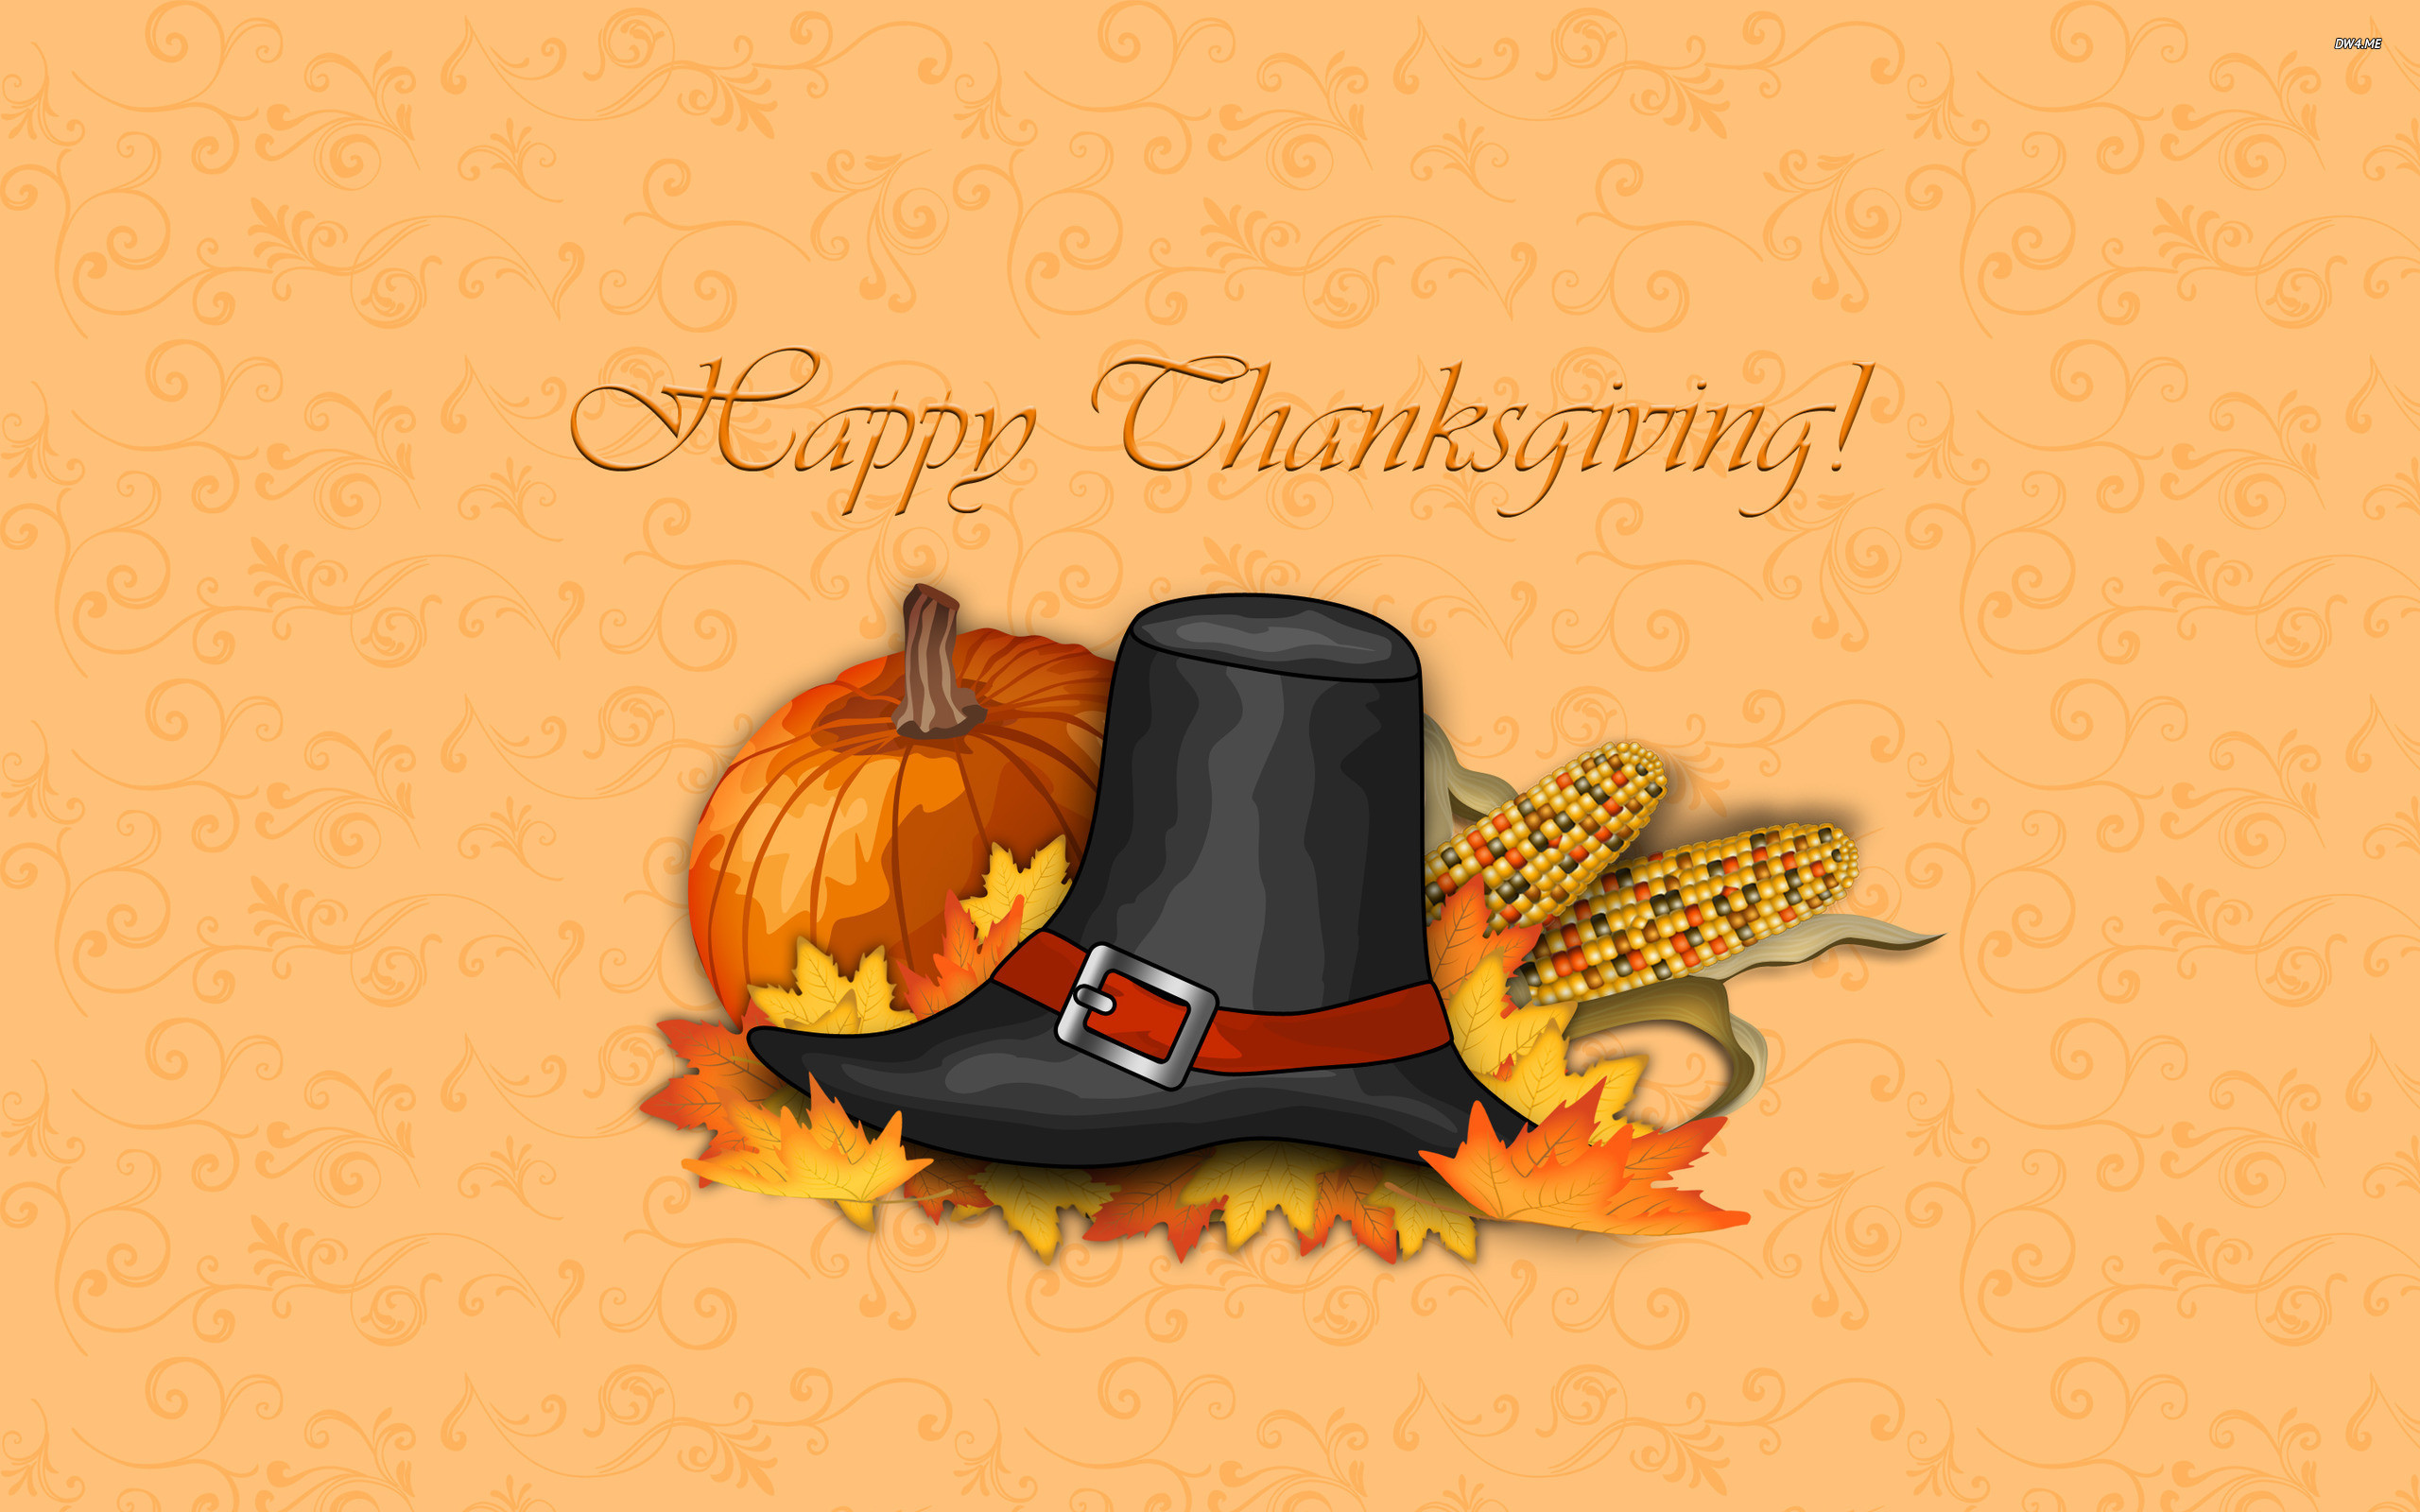 Res: 2560x1600, ... Happy Thanksgiving! wallpaper  ...